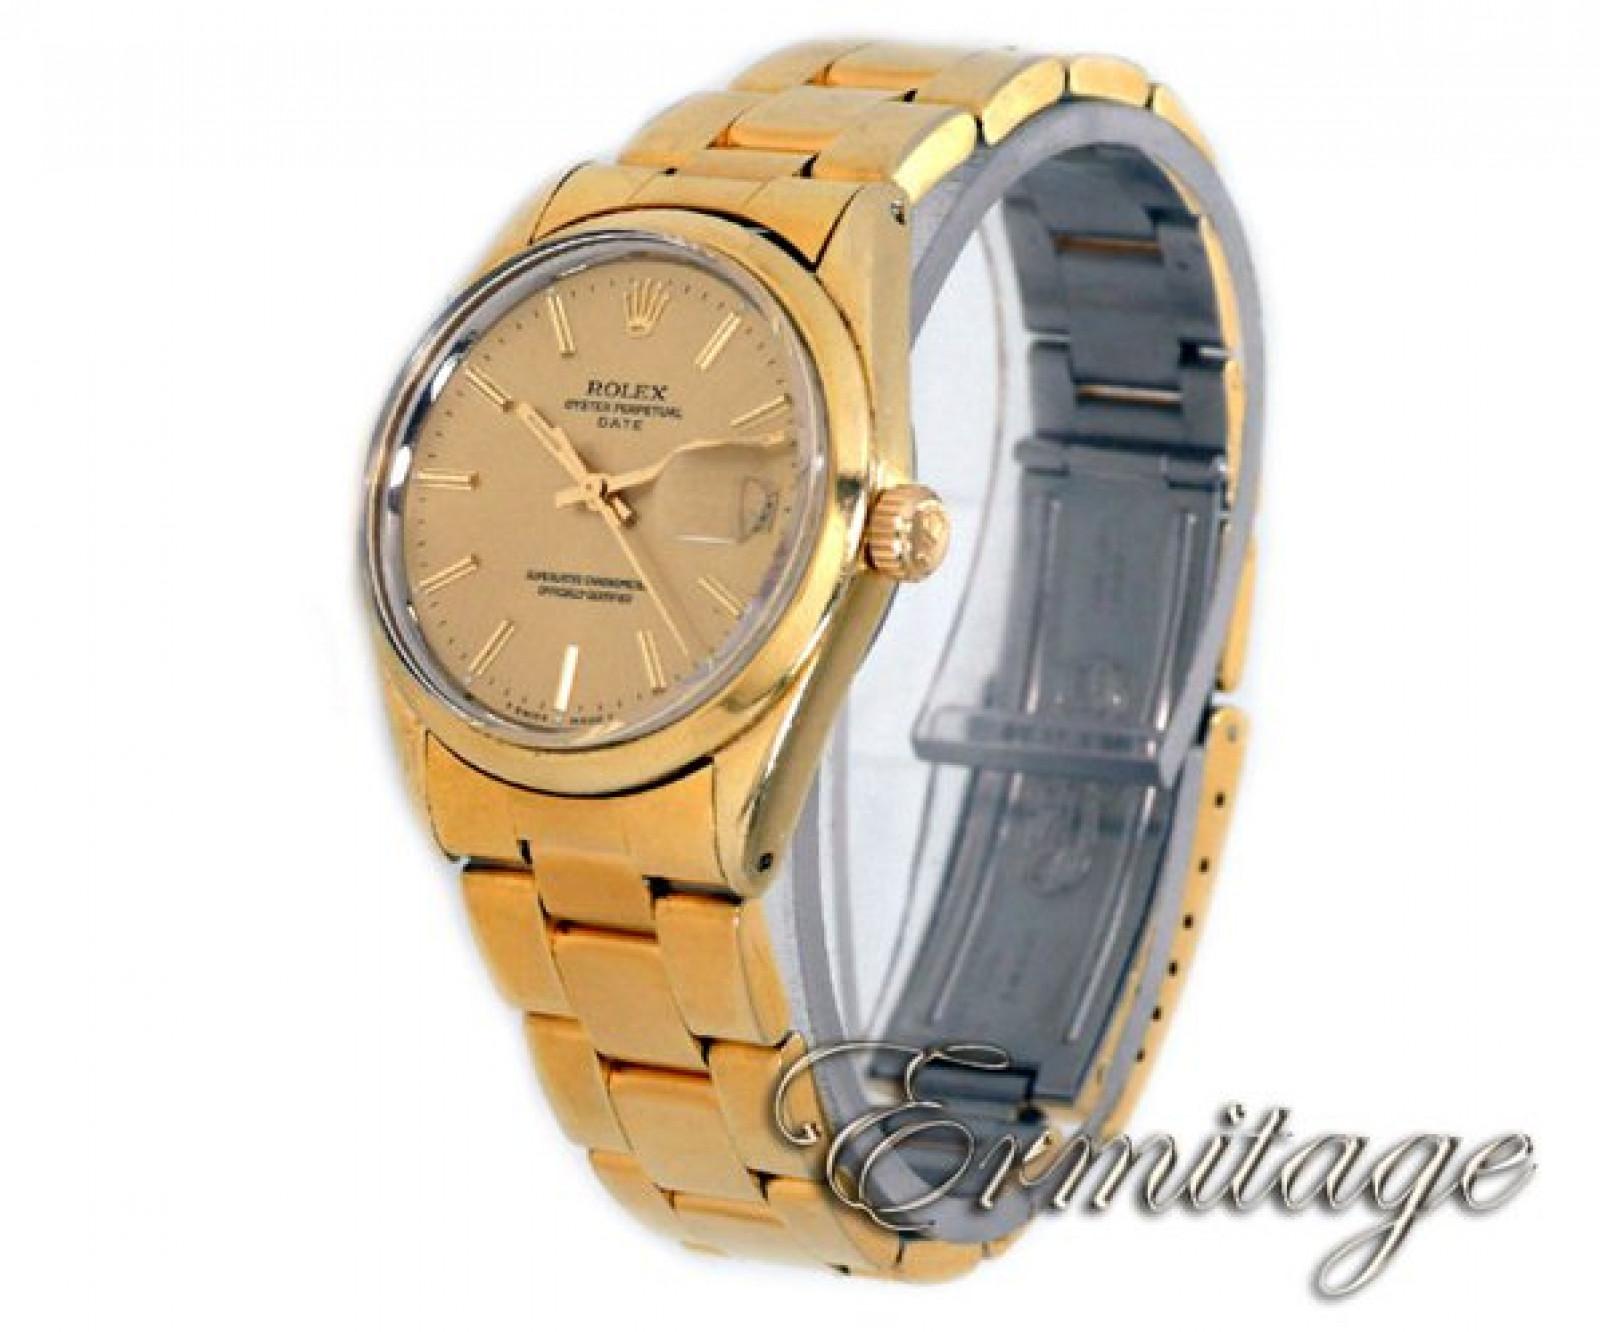 Vintage Rare Rolex Date 1550 Gold Year 1971